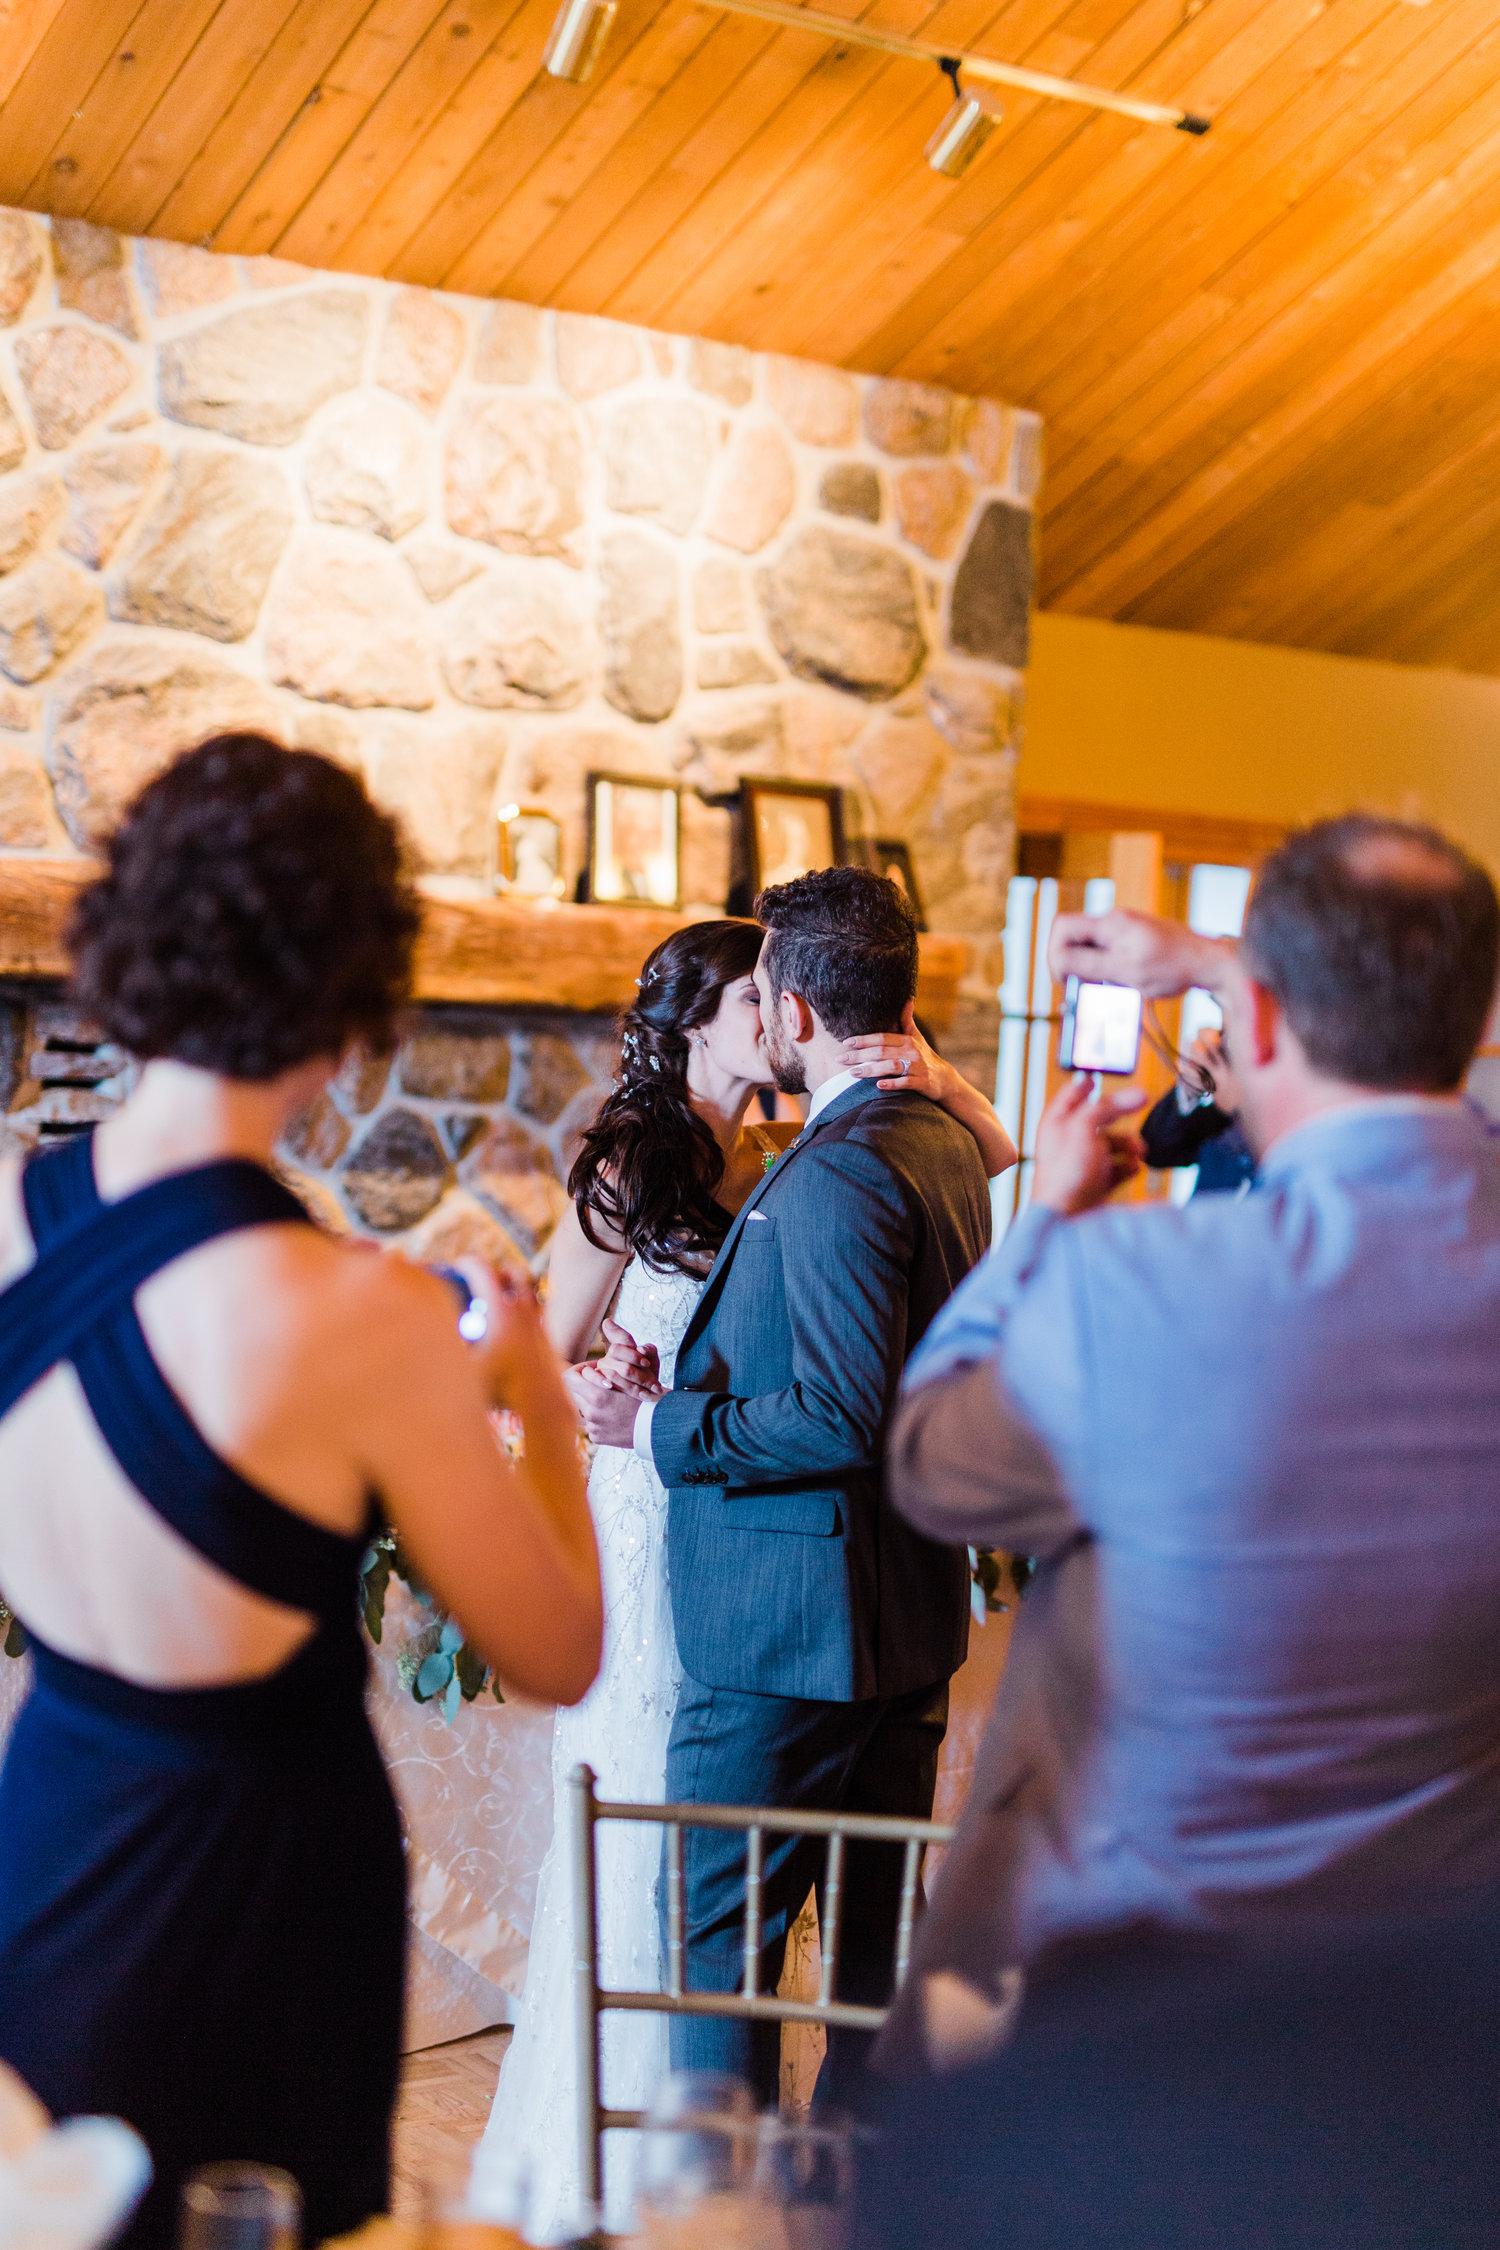 Amir-Golbazi-Danielle-Giroux-Photography_Toronto-Wedding_Cedarwood_Rachel-Paul_594.jpg